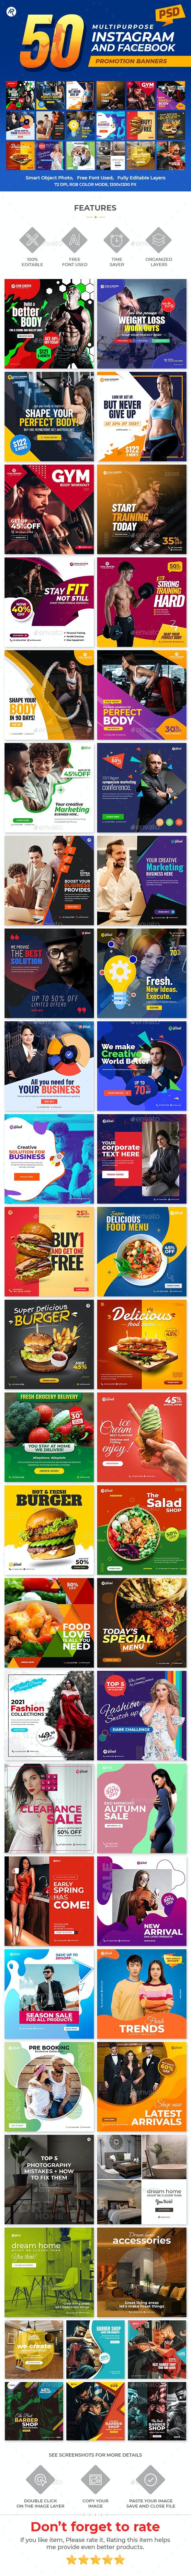 50-Instagram & Facebook Promotional Banners